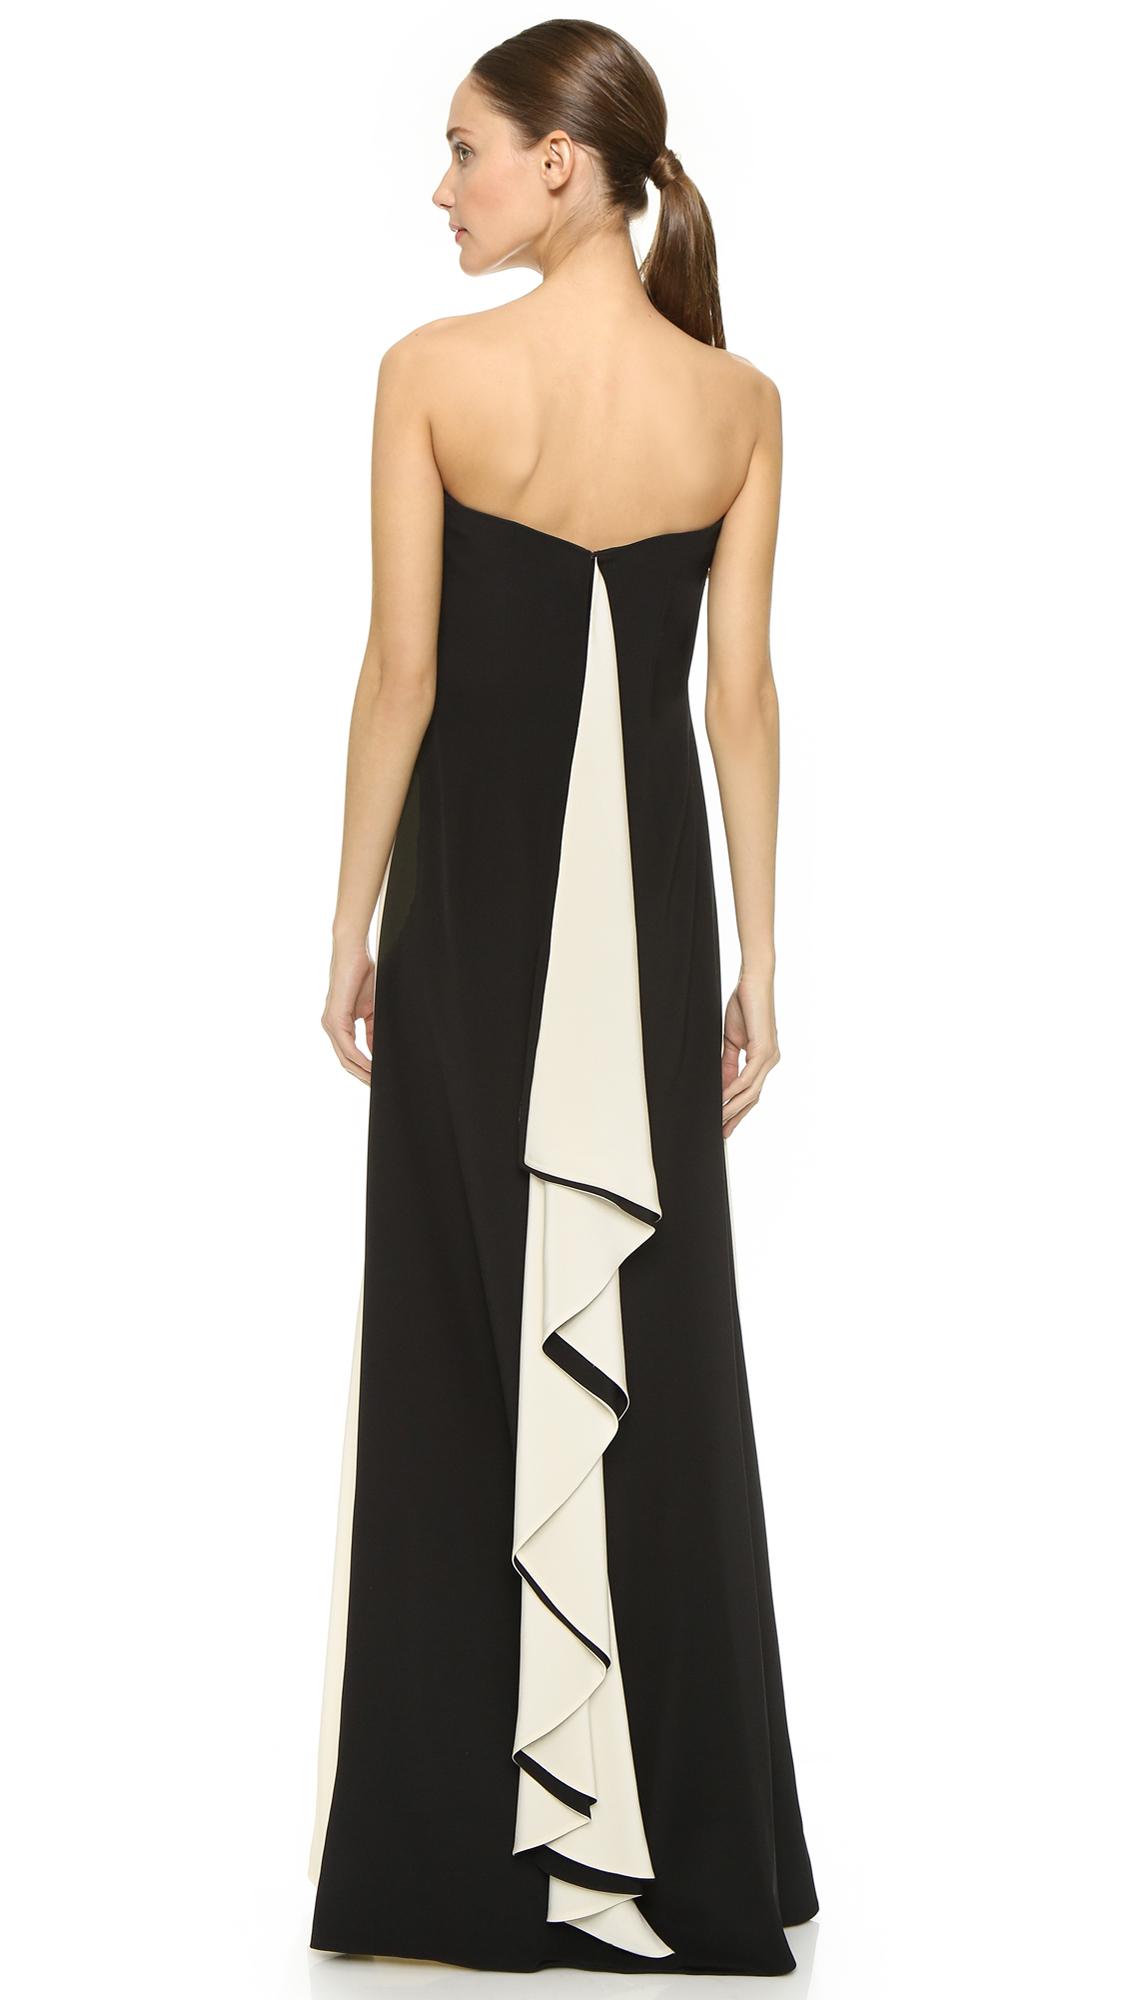 Lyst - Prabal Gurung Strapless Gown - Black/ivory in Black